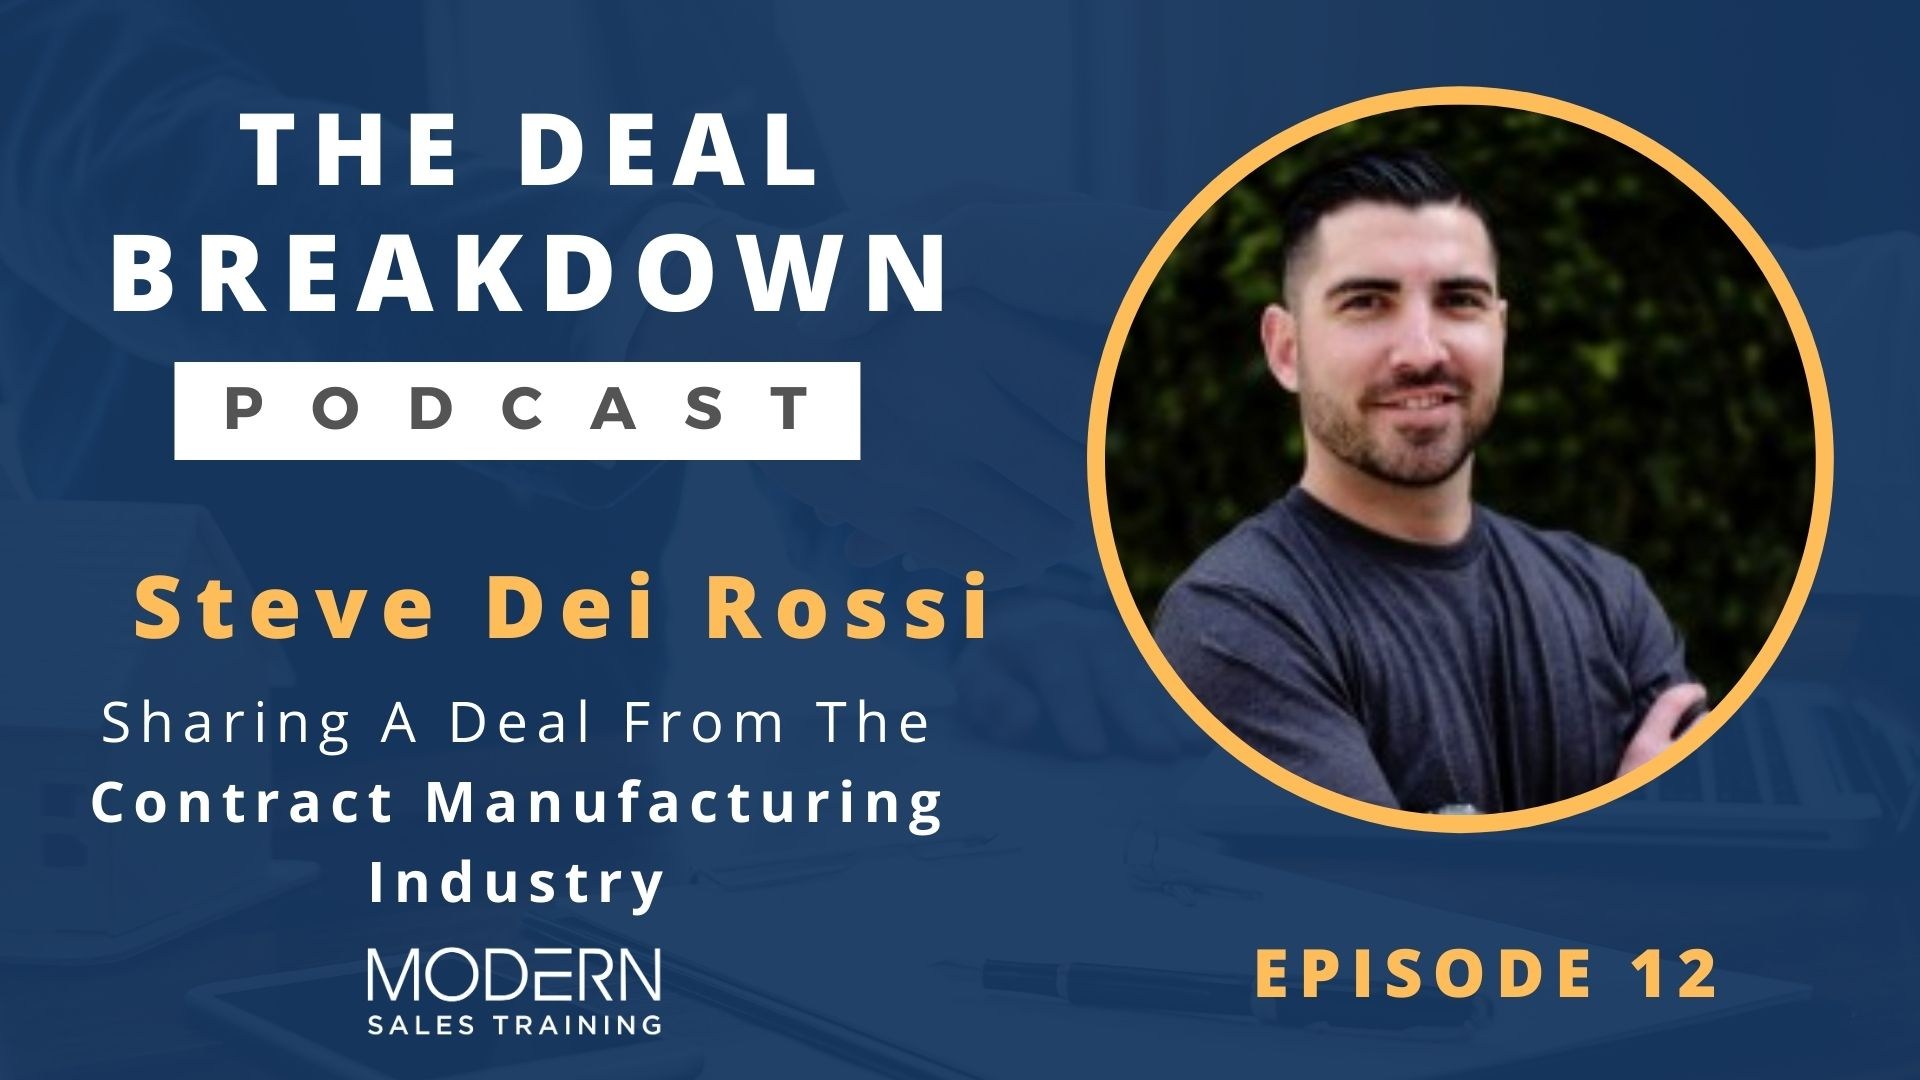 The-Deal-Breakdown-Podcast-Modern-Sales-Training-Steve-Dei-Rossi